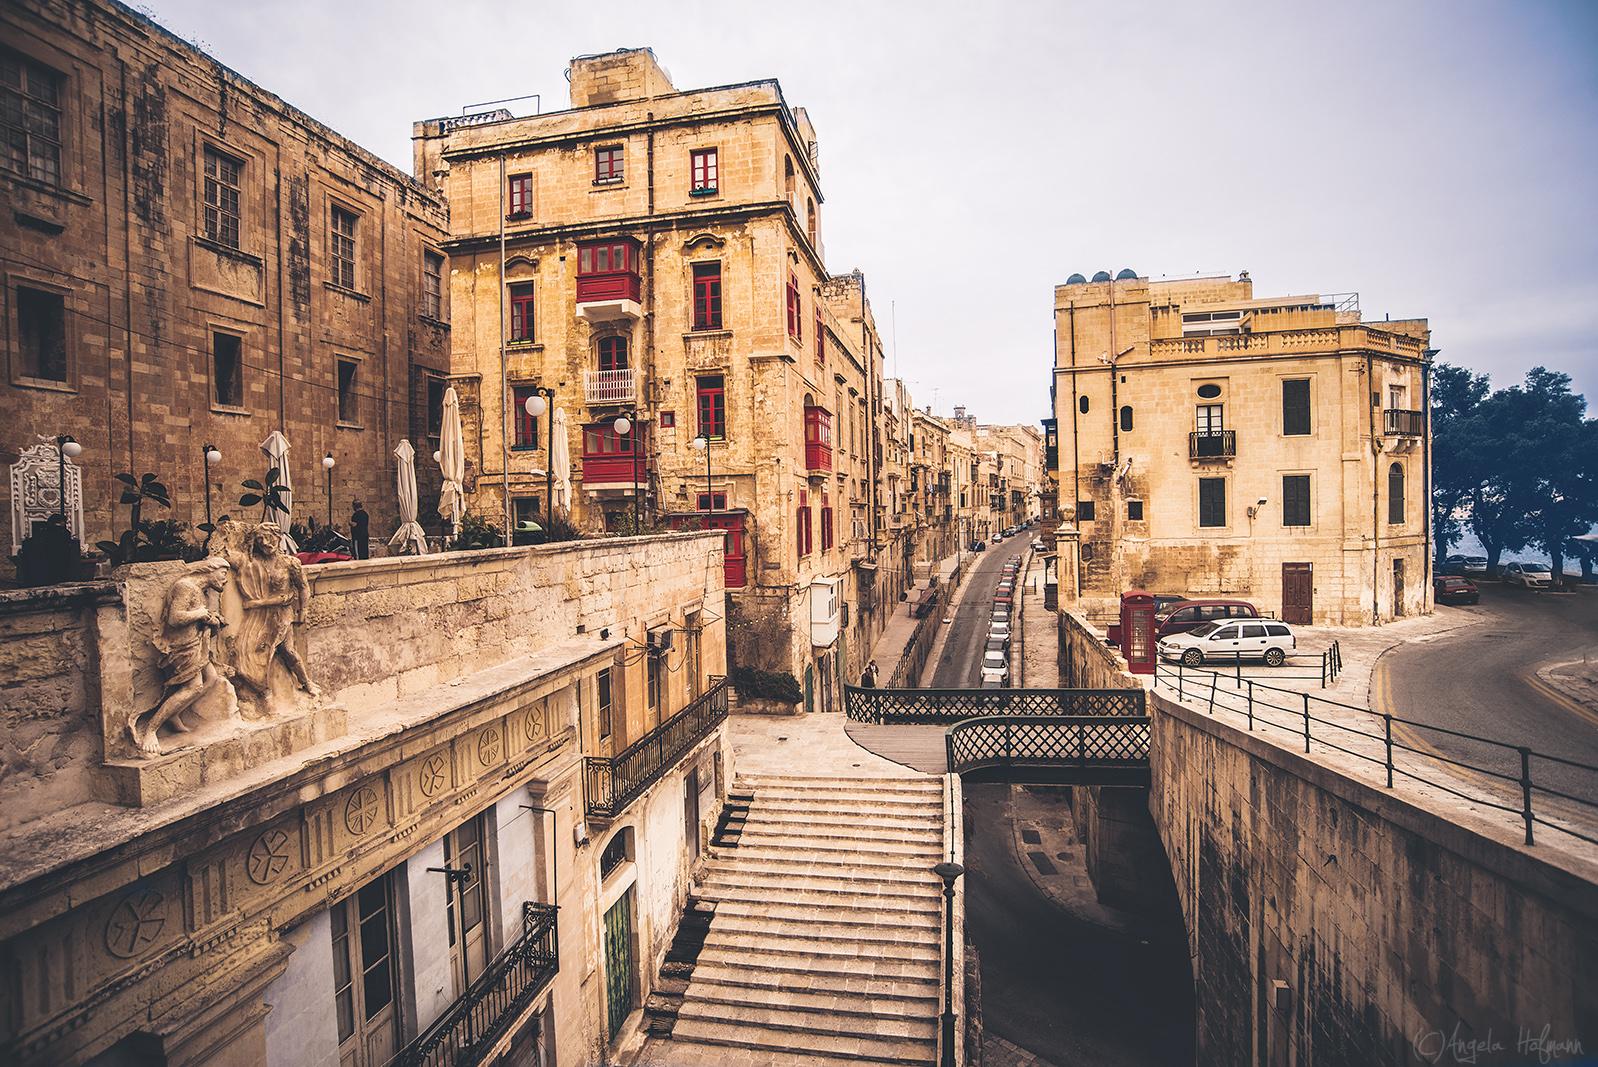 This is Malta